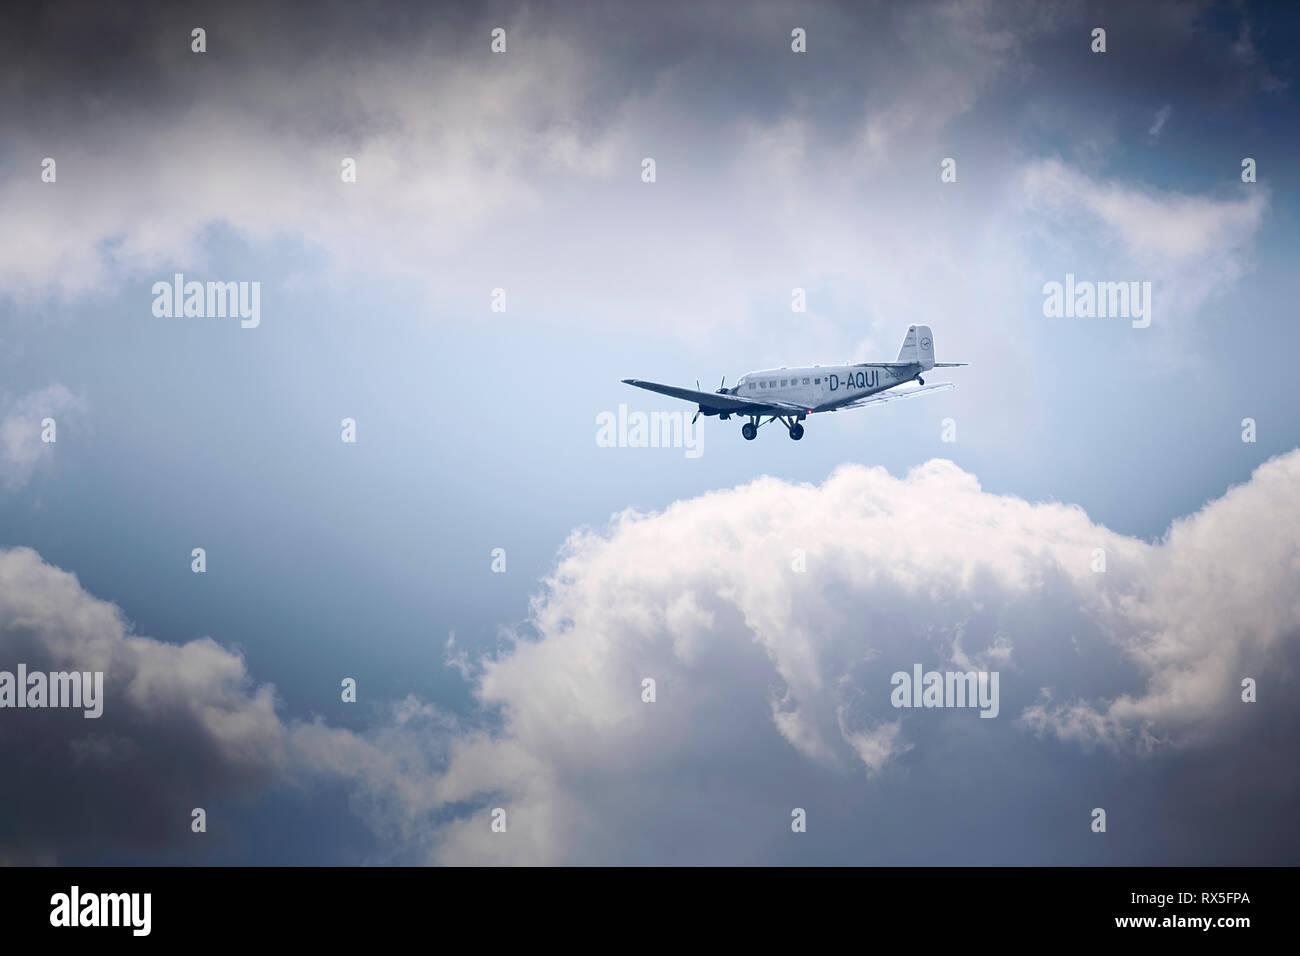 Tante Ju (Junker Ju 52) fliegt am dramatisch bewoelkten Himmel ueber Essen - Stock Image